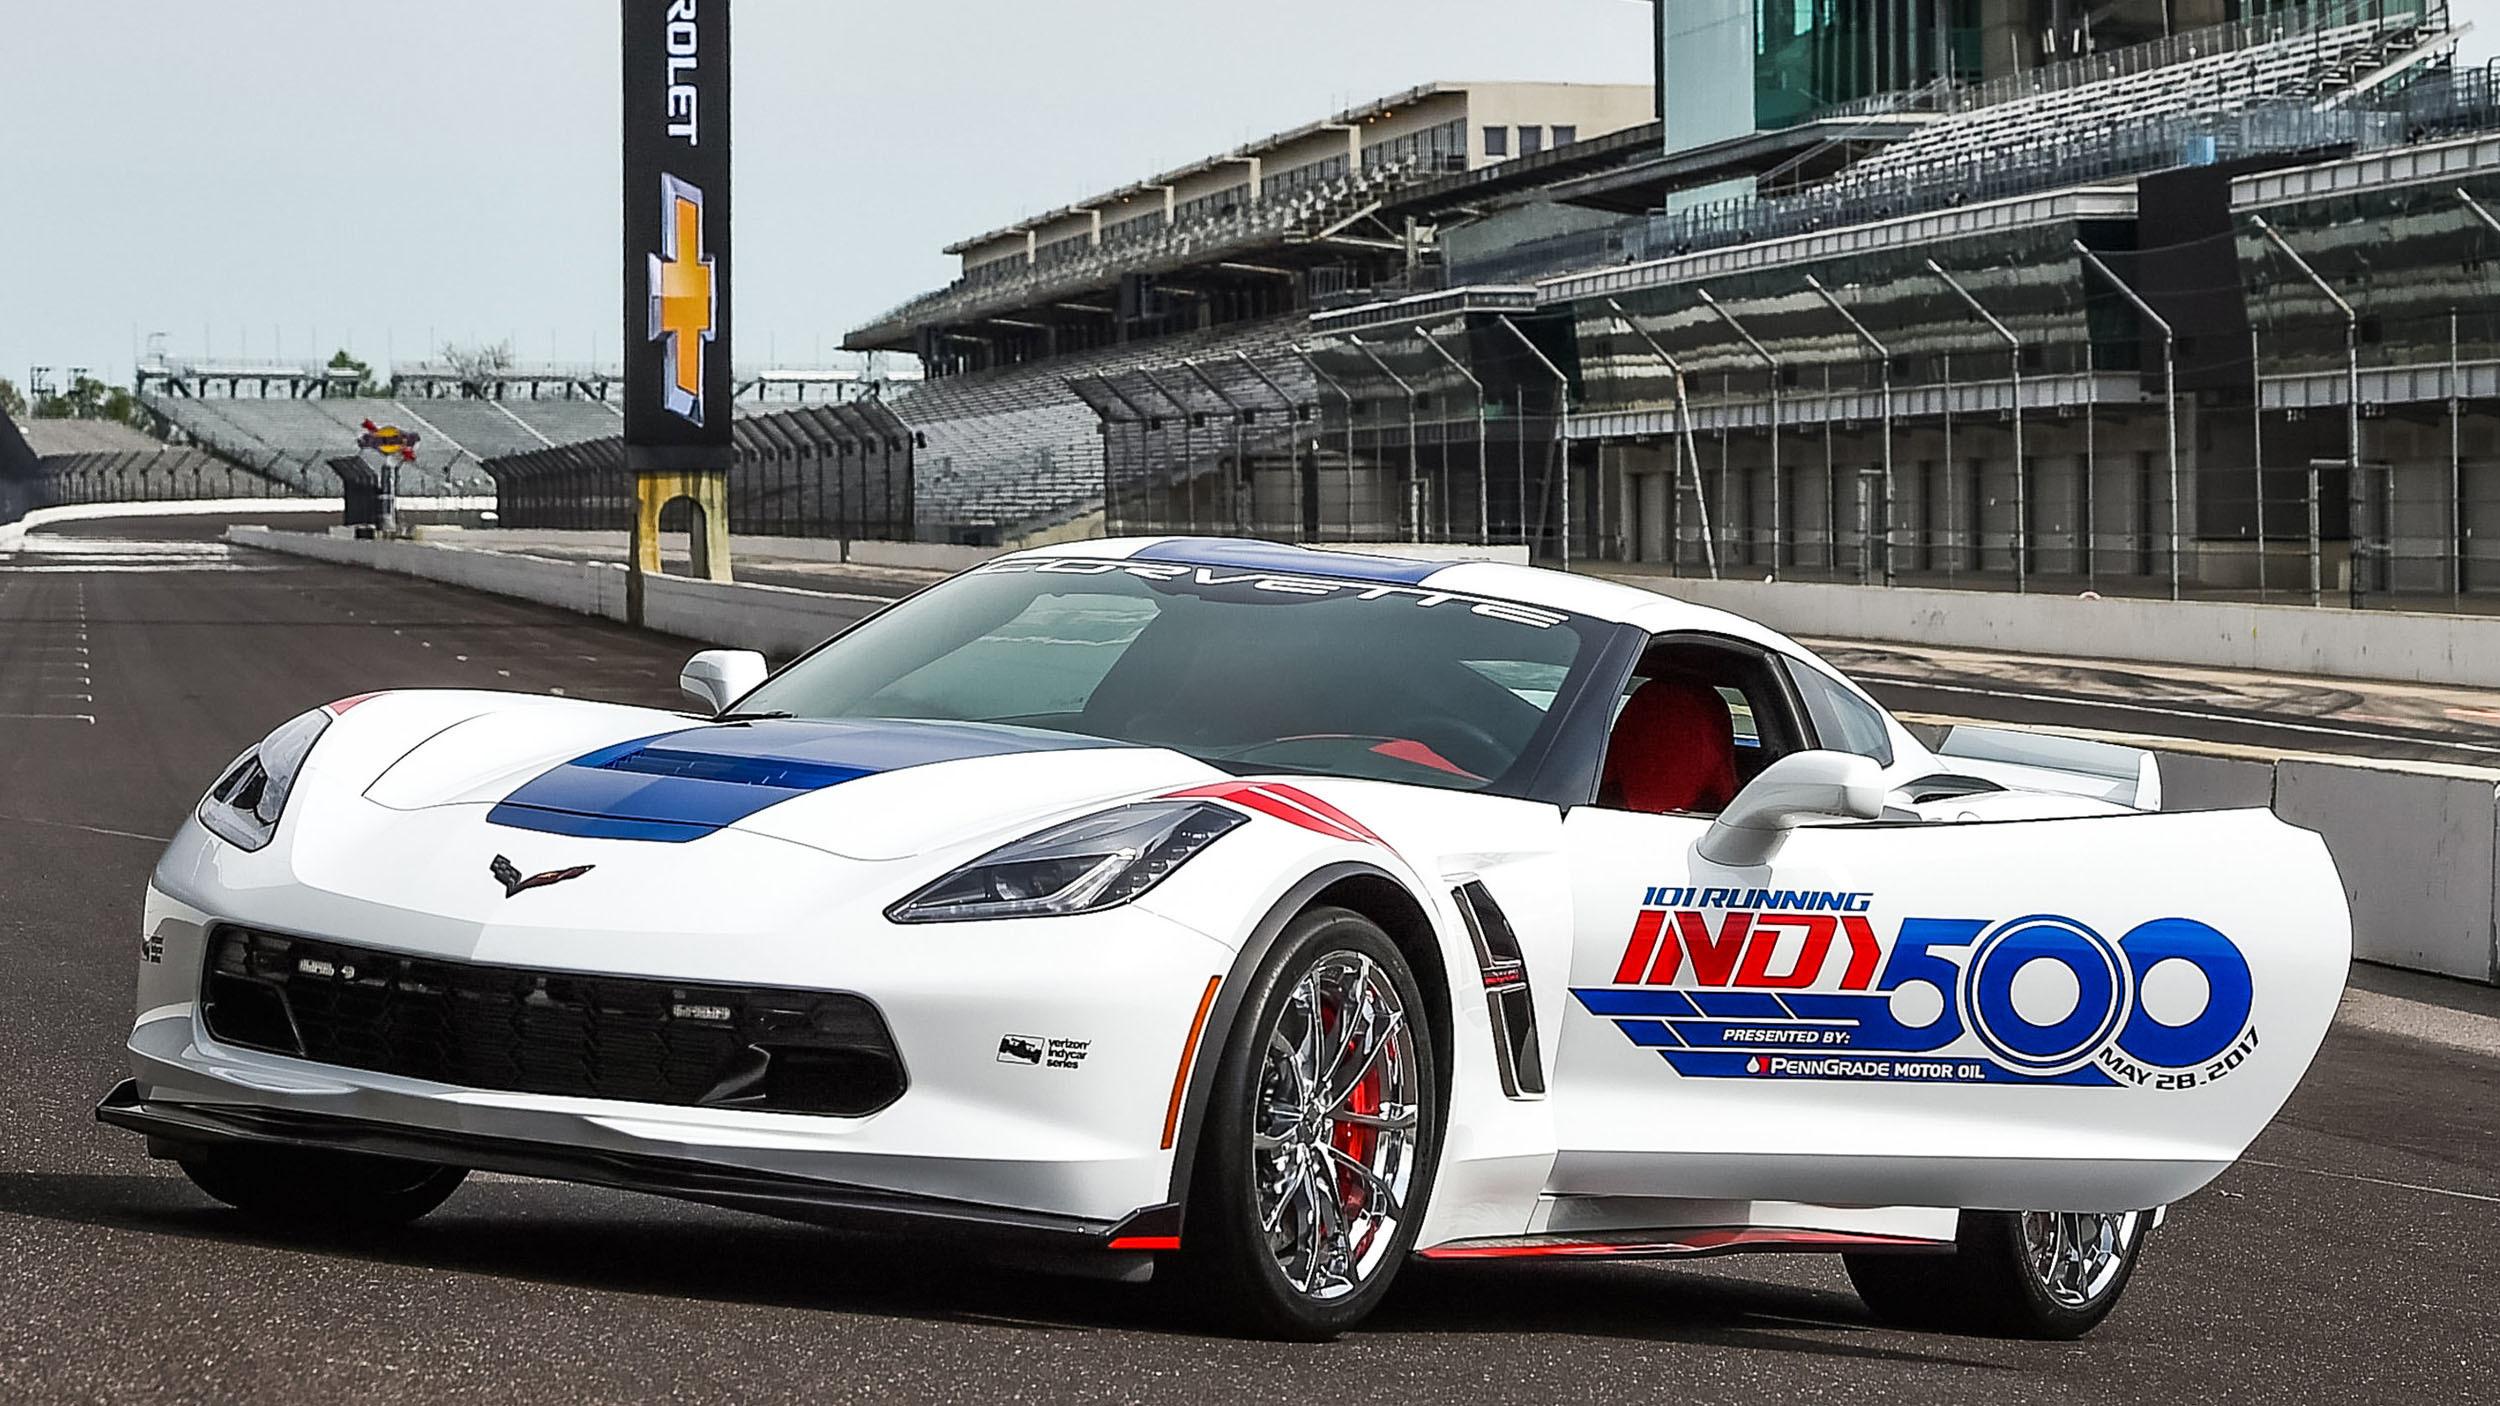 Chevrolet Corvette Grand Sport pace car Indy 500 (4)